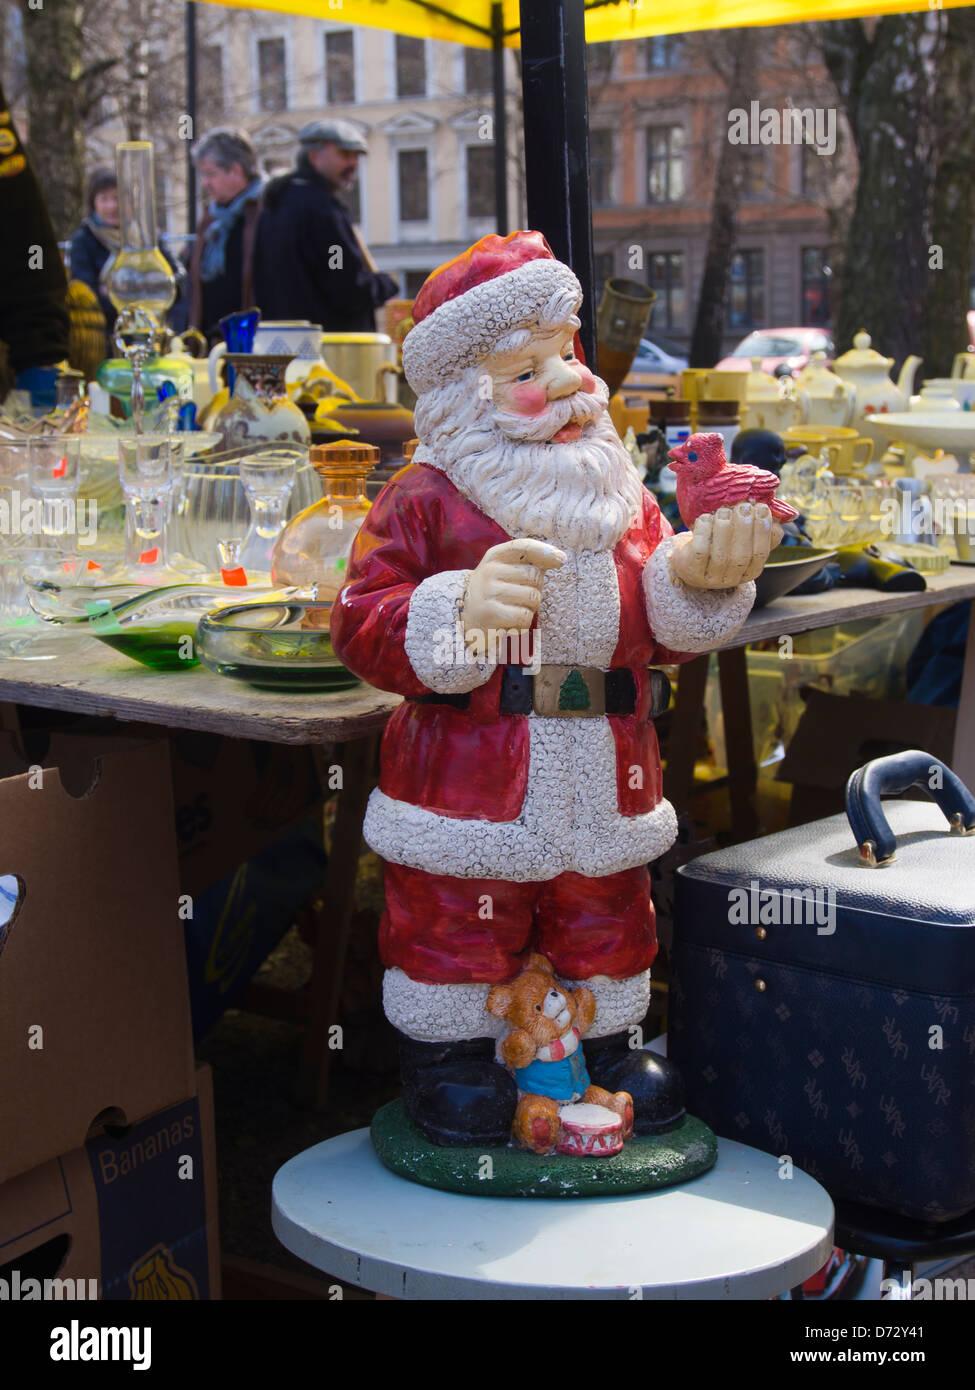 Large Santa Claus Statue Stockfotos & Large Santa Claus Statue ...